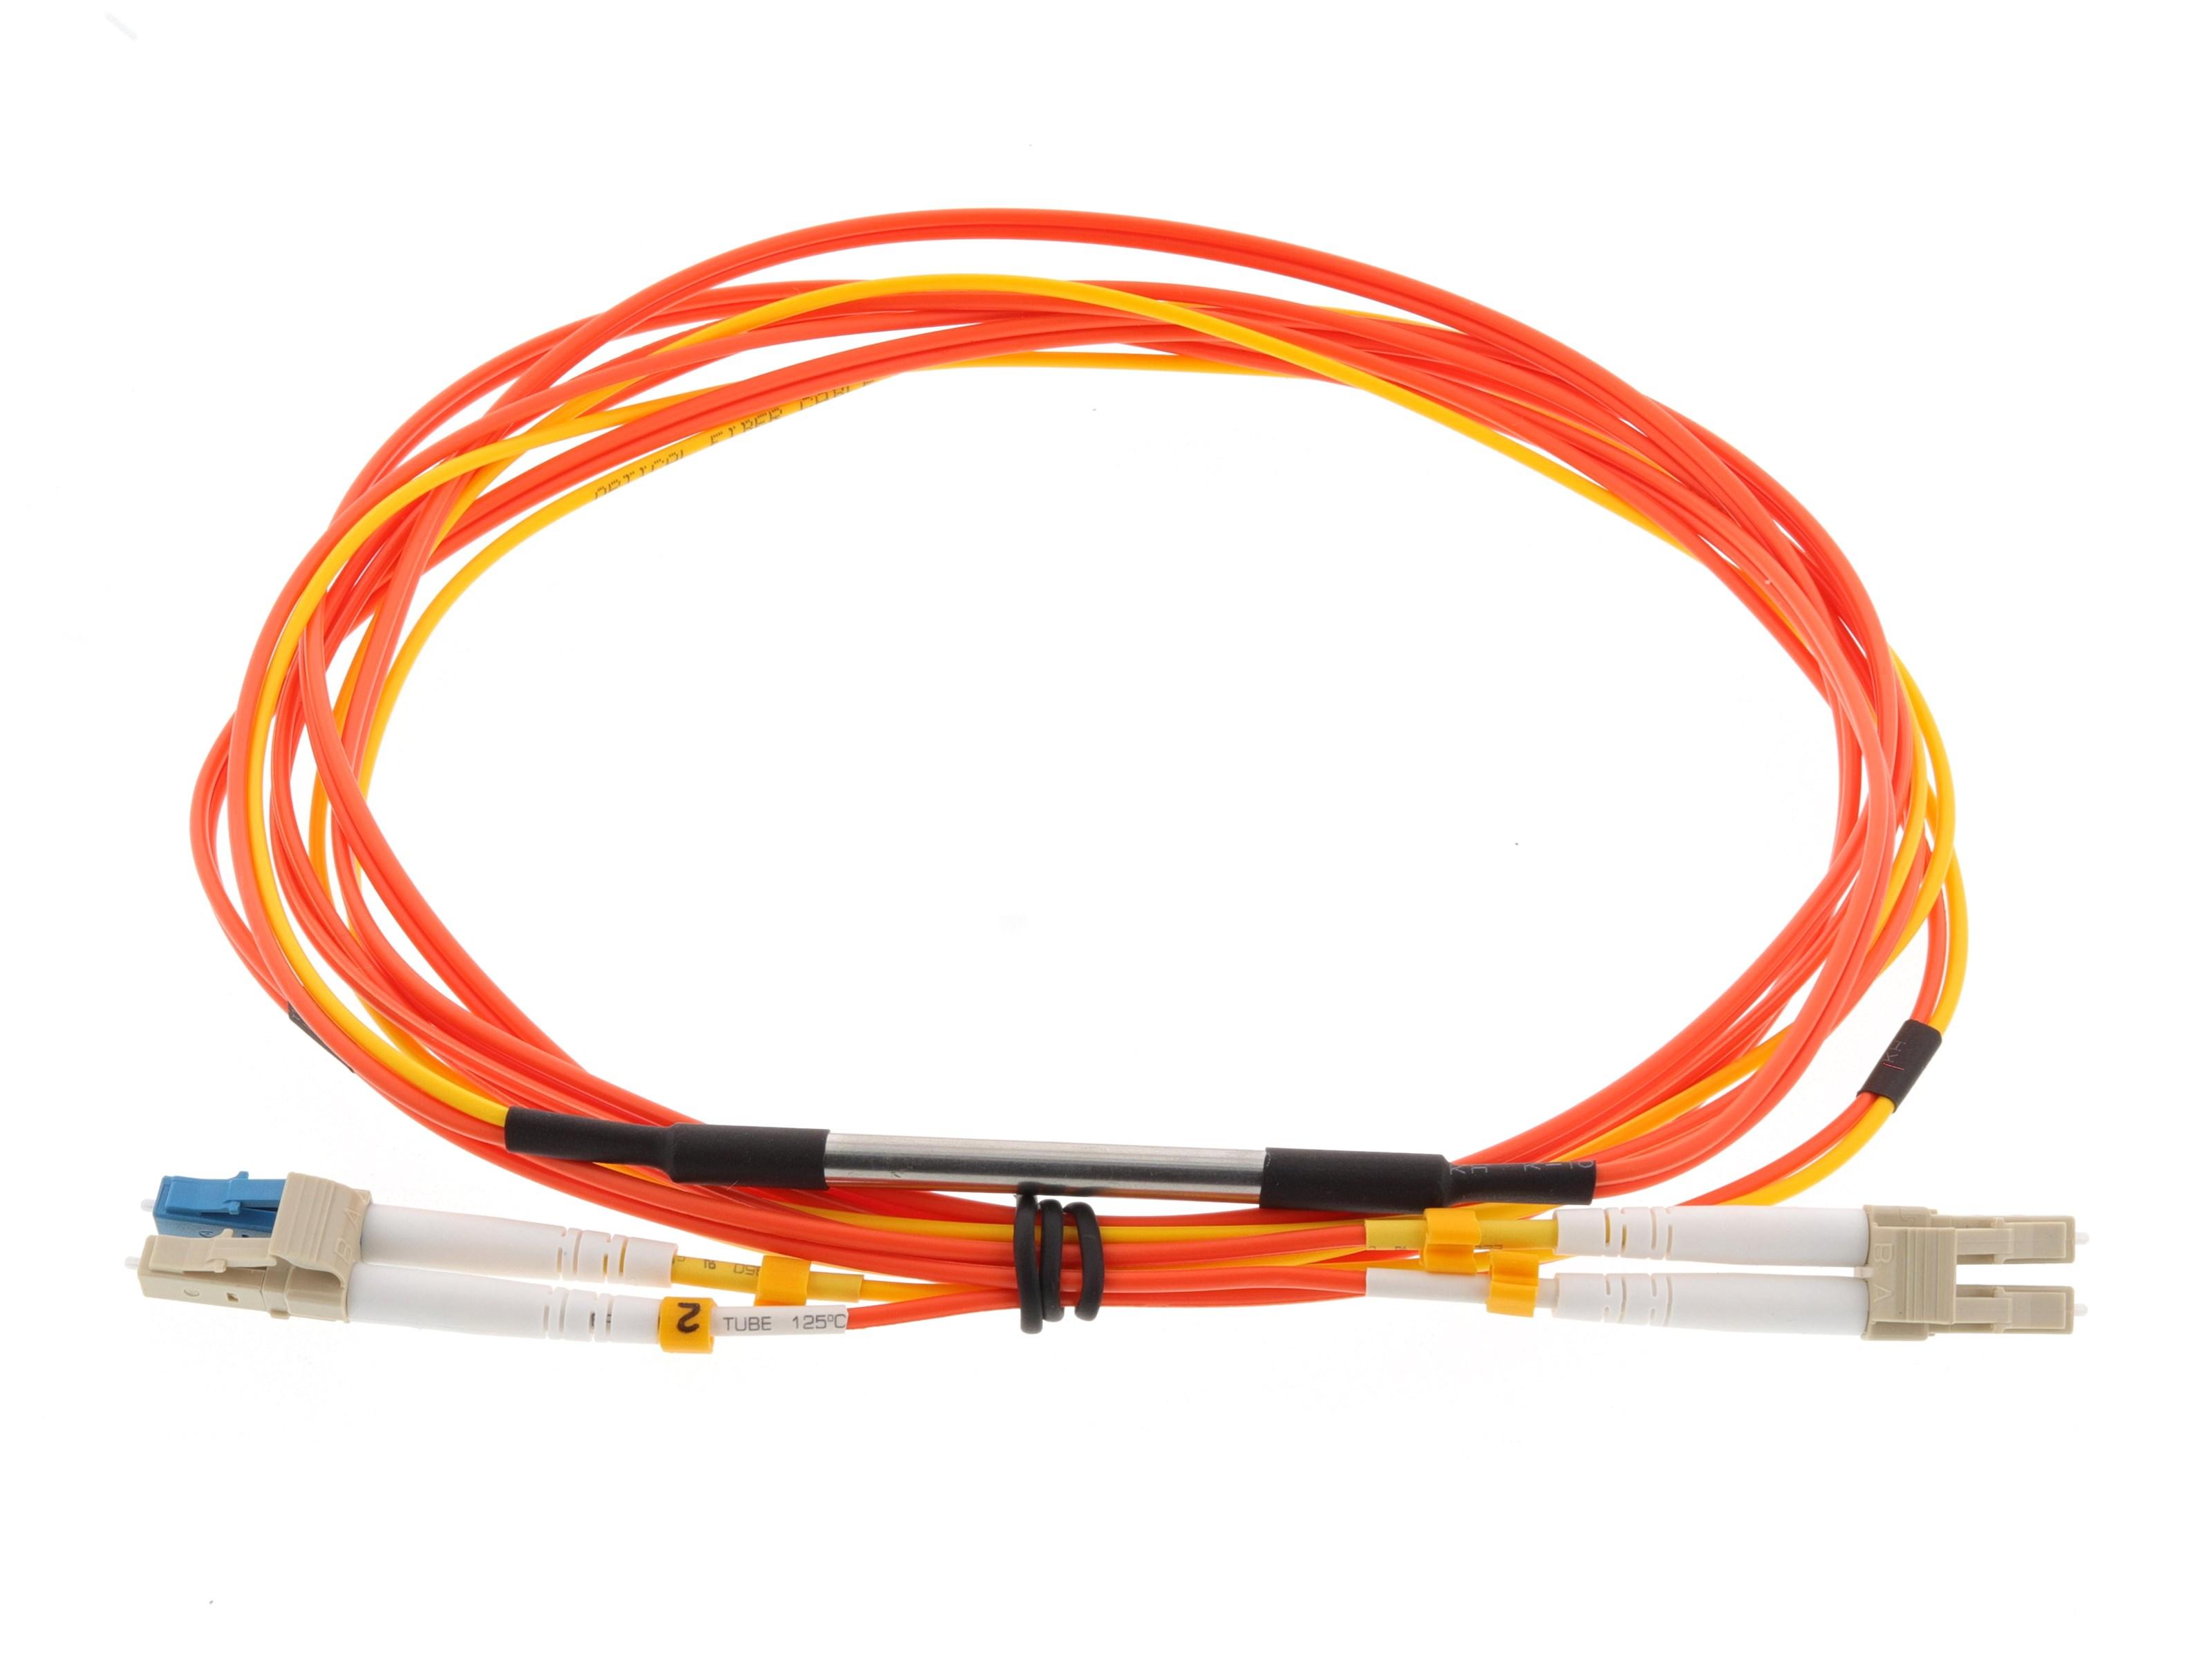 5m Mode Conditioning Duplex Fiber Optic Patch Cable 50